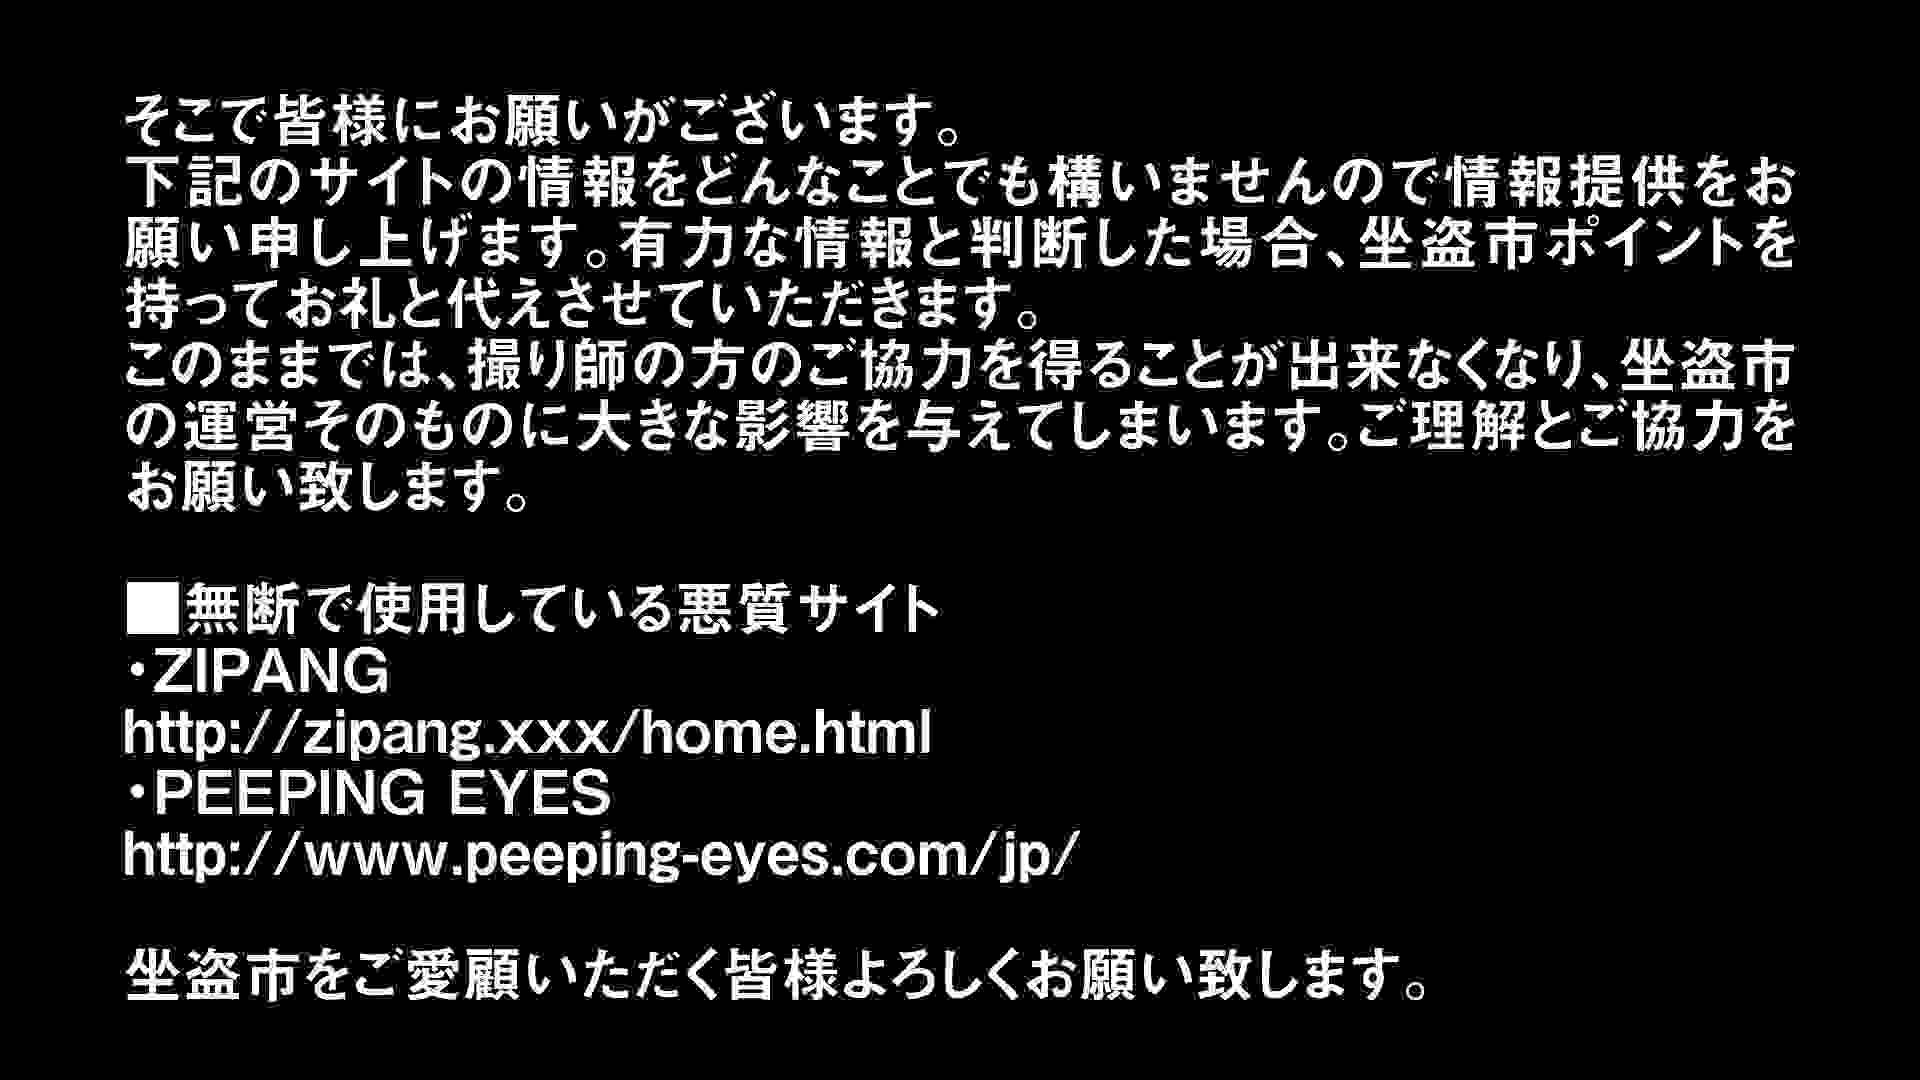 Aquaな露天風呂Vol.297 OLのプライベート | 盗撮特撮  13pic 4